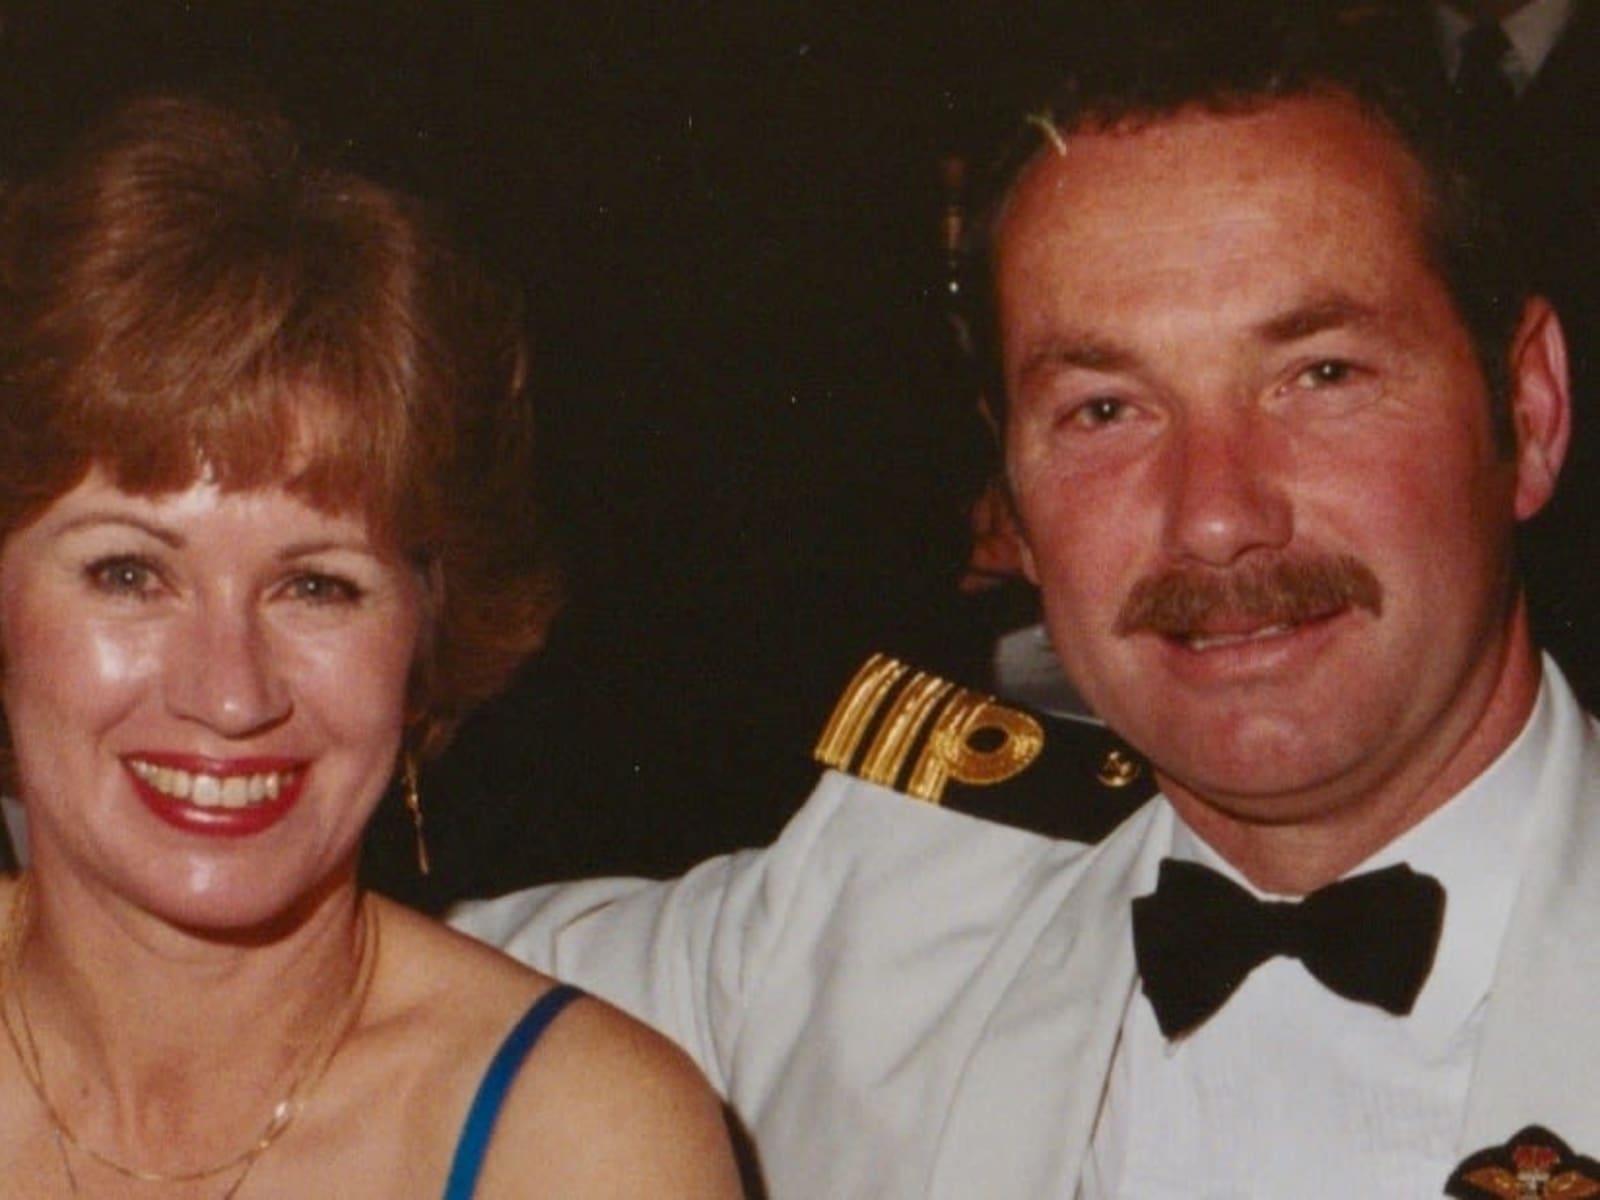 Gail & Tom from Cranbrook, British Columbia, Canada